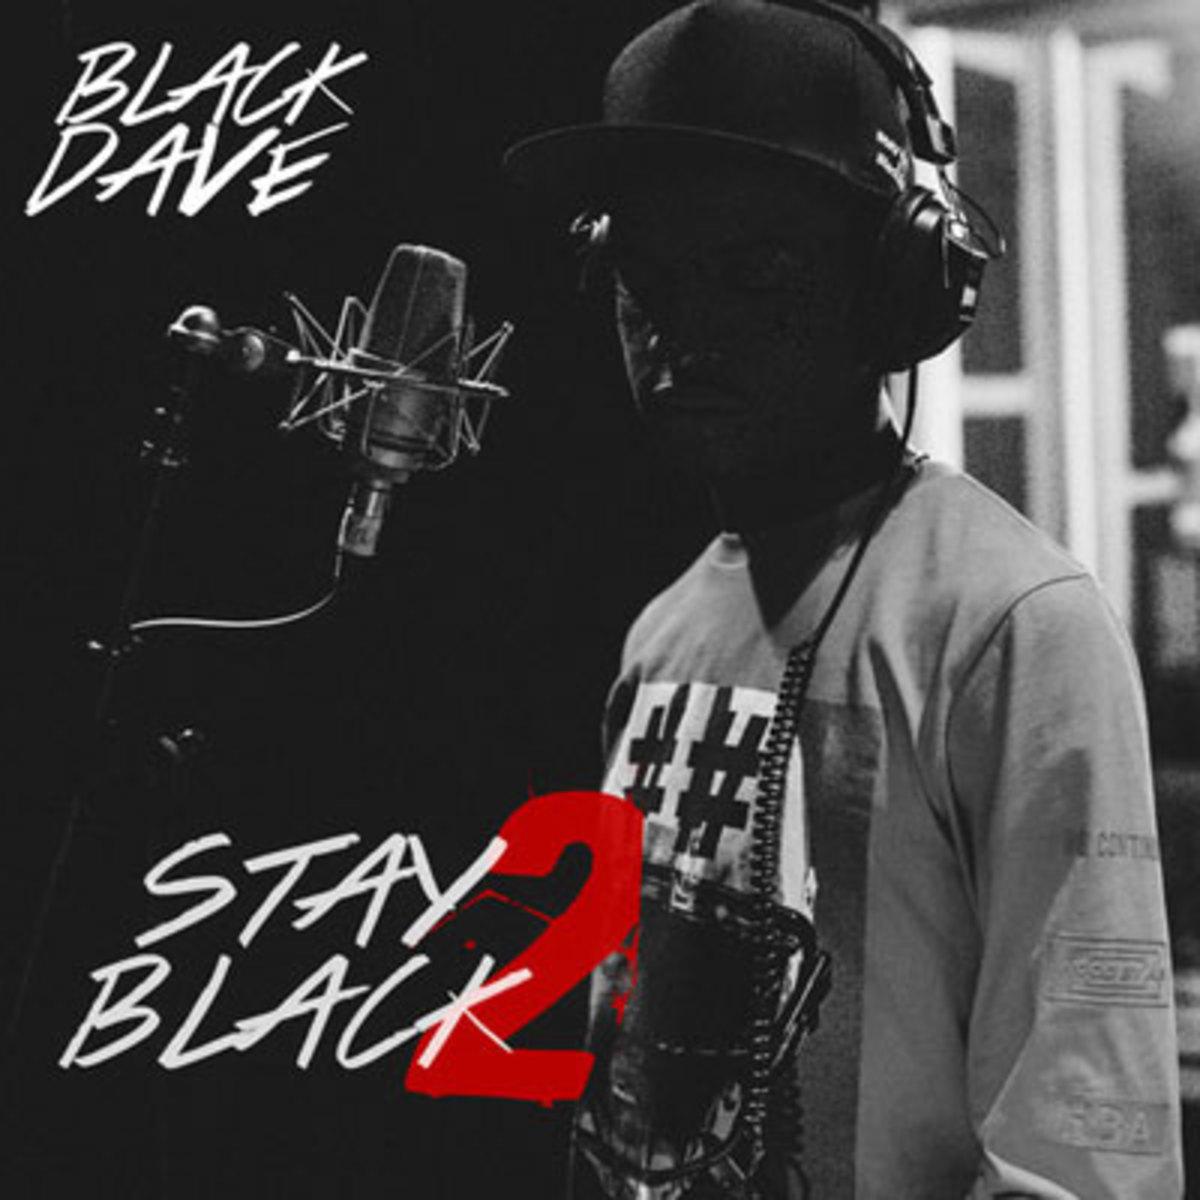 blackdave-stayblack2.jpg